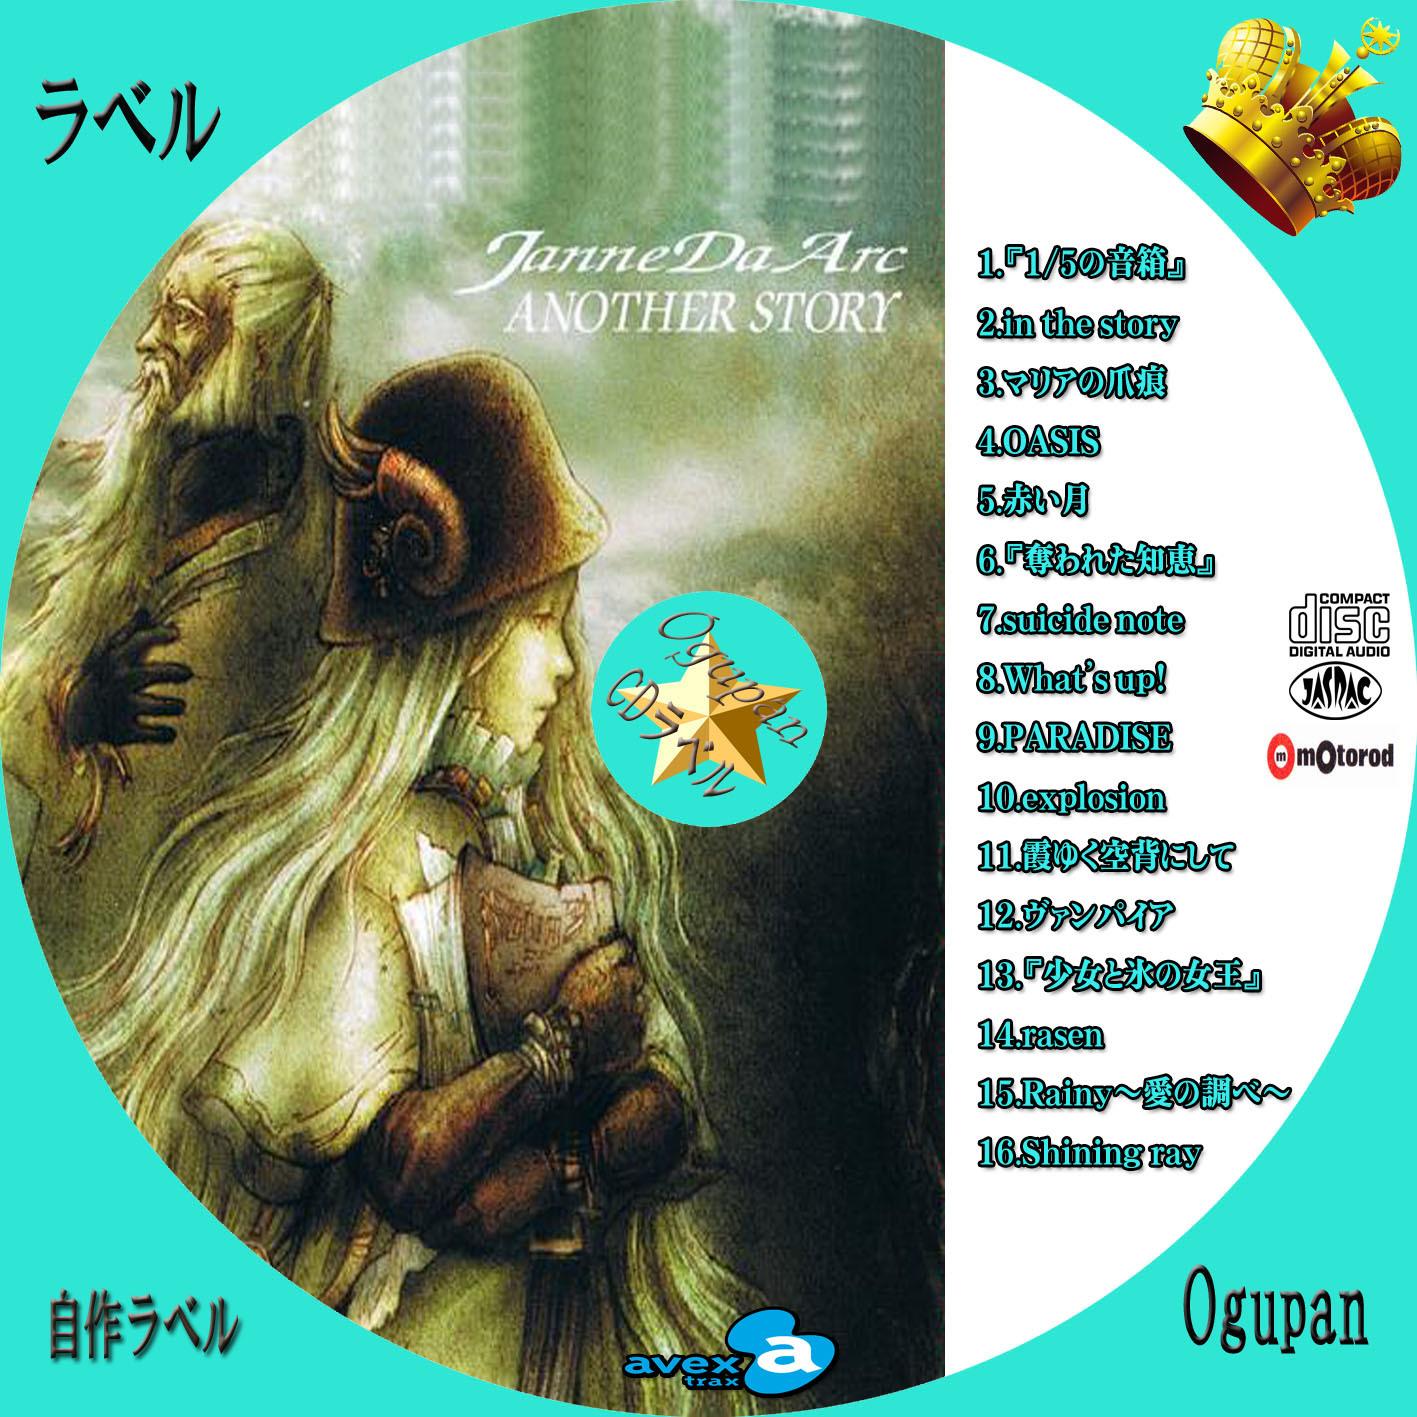 Idlewilde Apartments: Ogupanの自作cd Dvdラベル 音楽 Cd